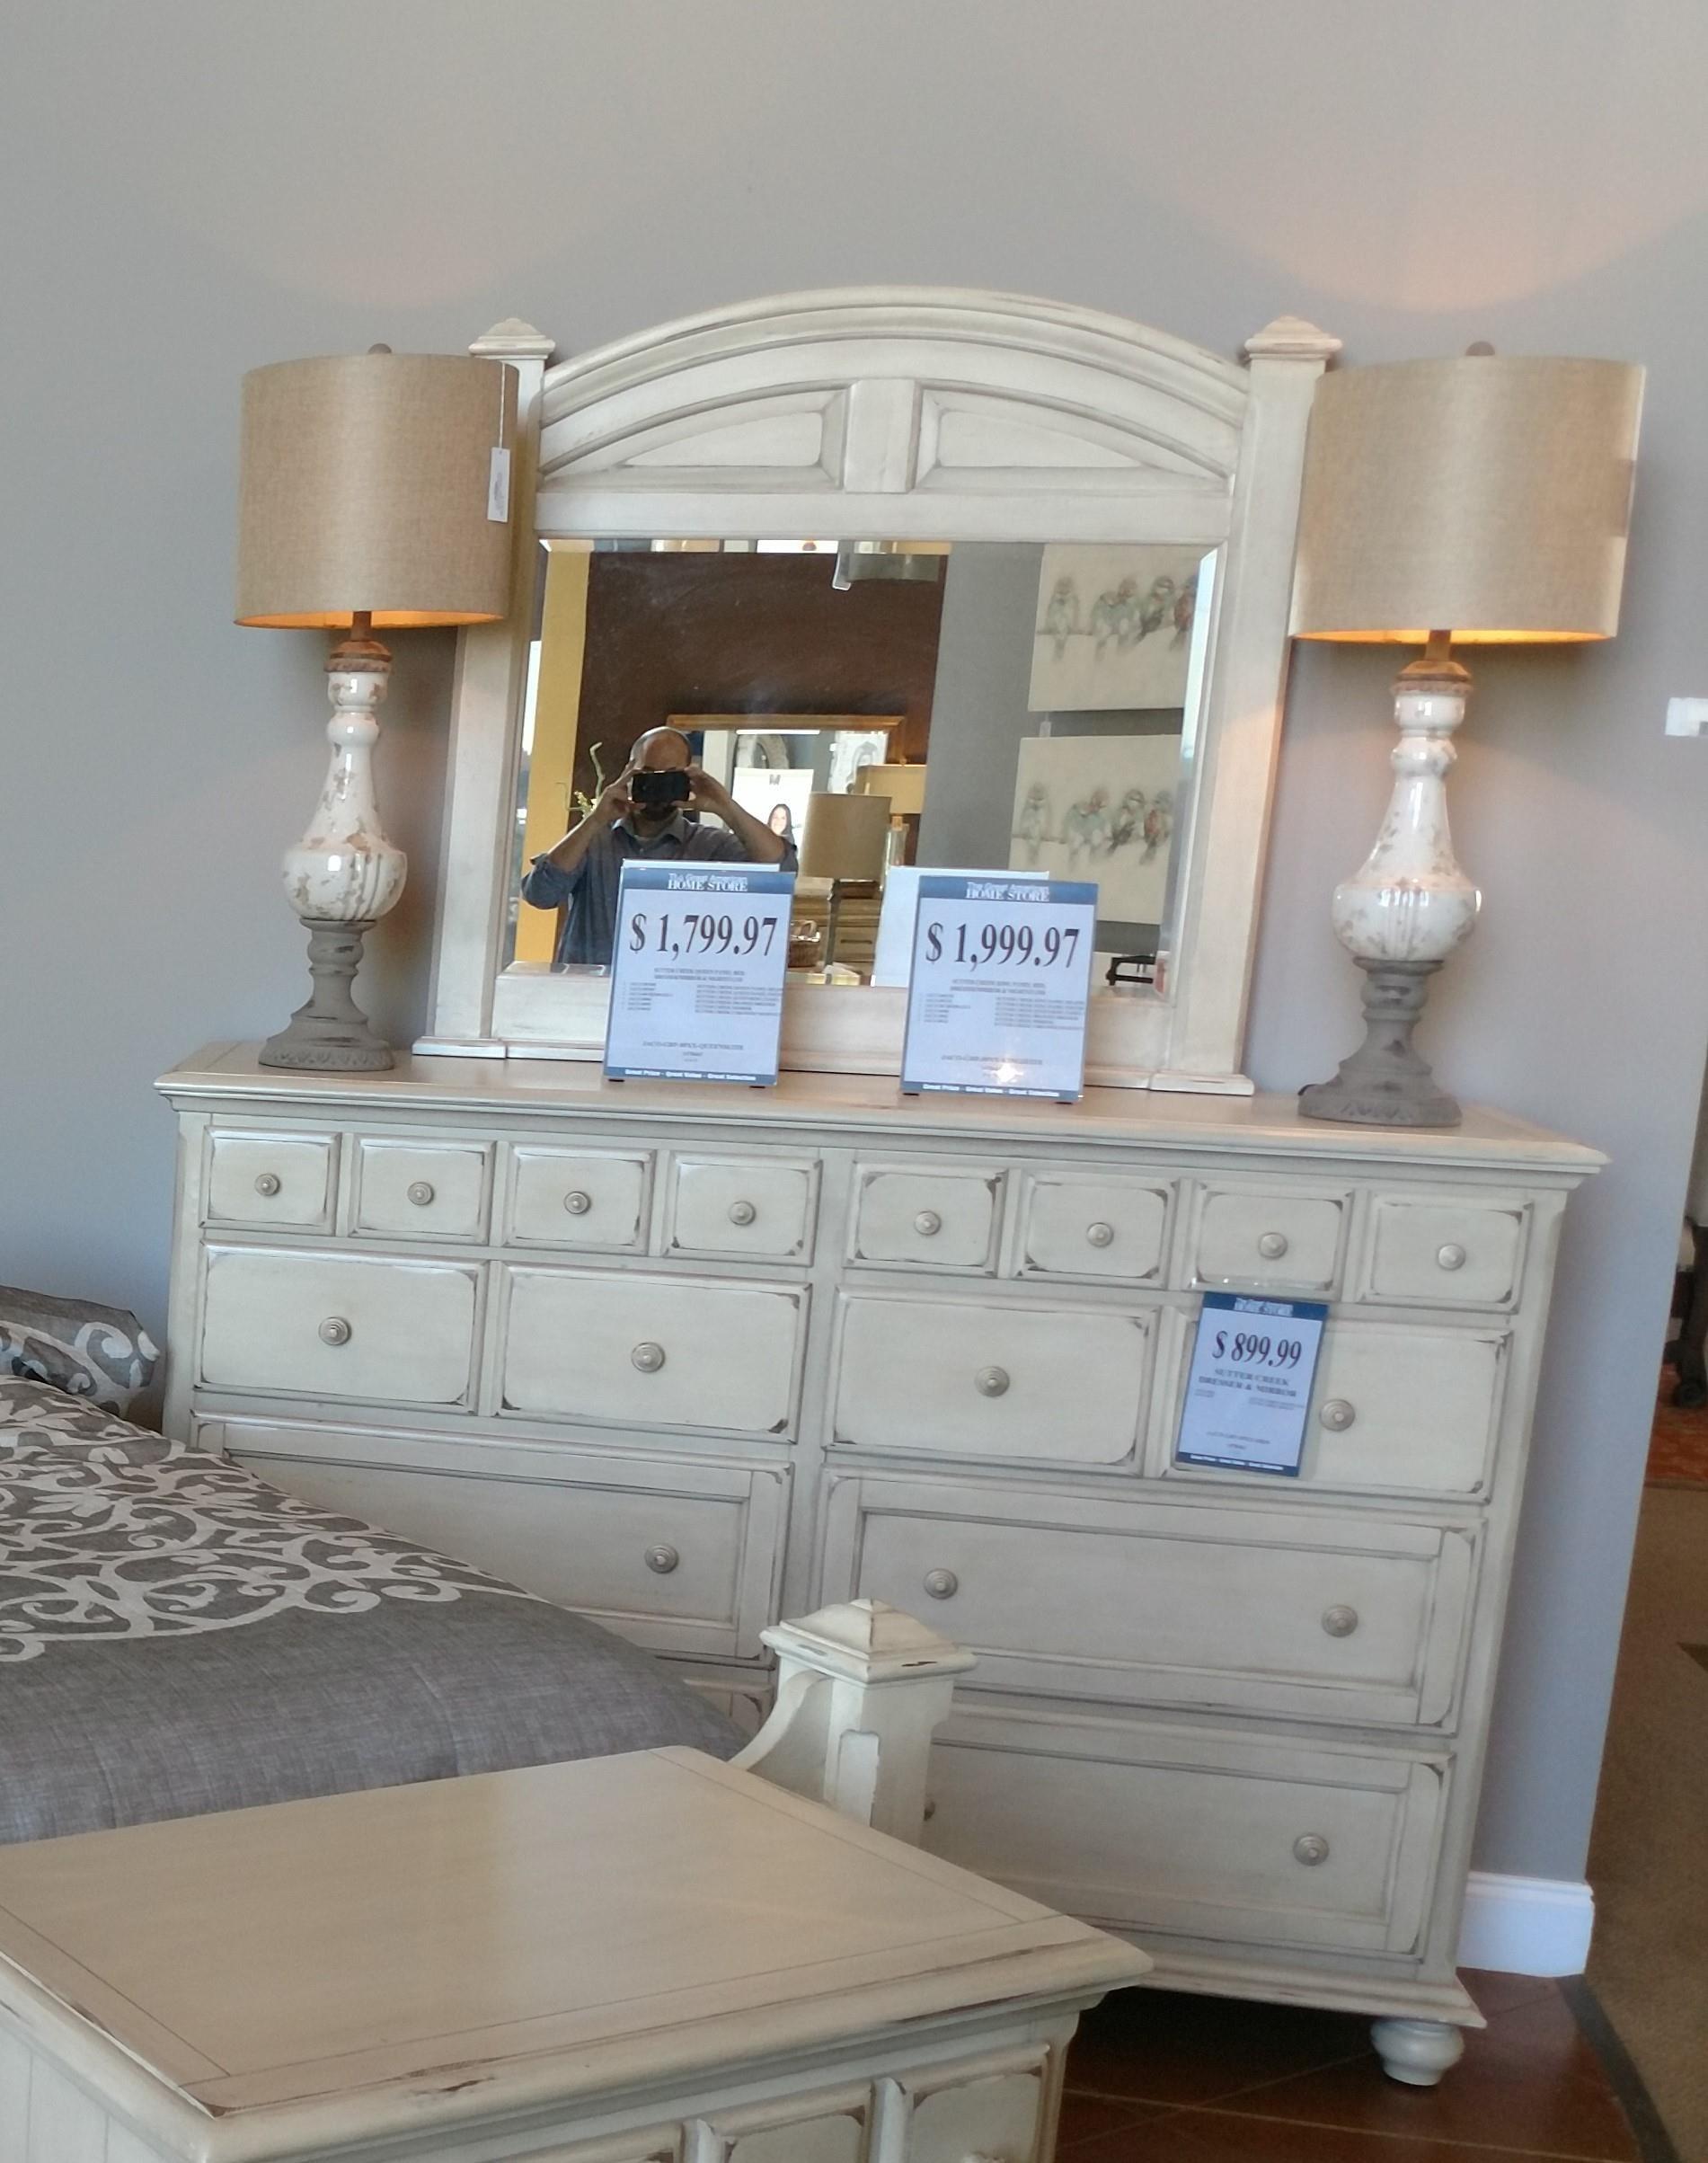 Jacob Edwards Designs Sutter Creek Drawer Dresser & Mirror - Item Number: GRP-89XX-DRM